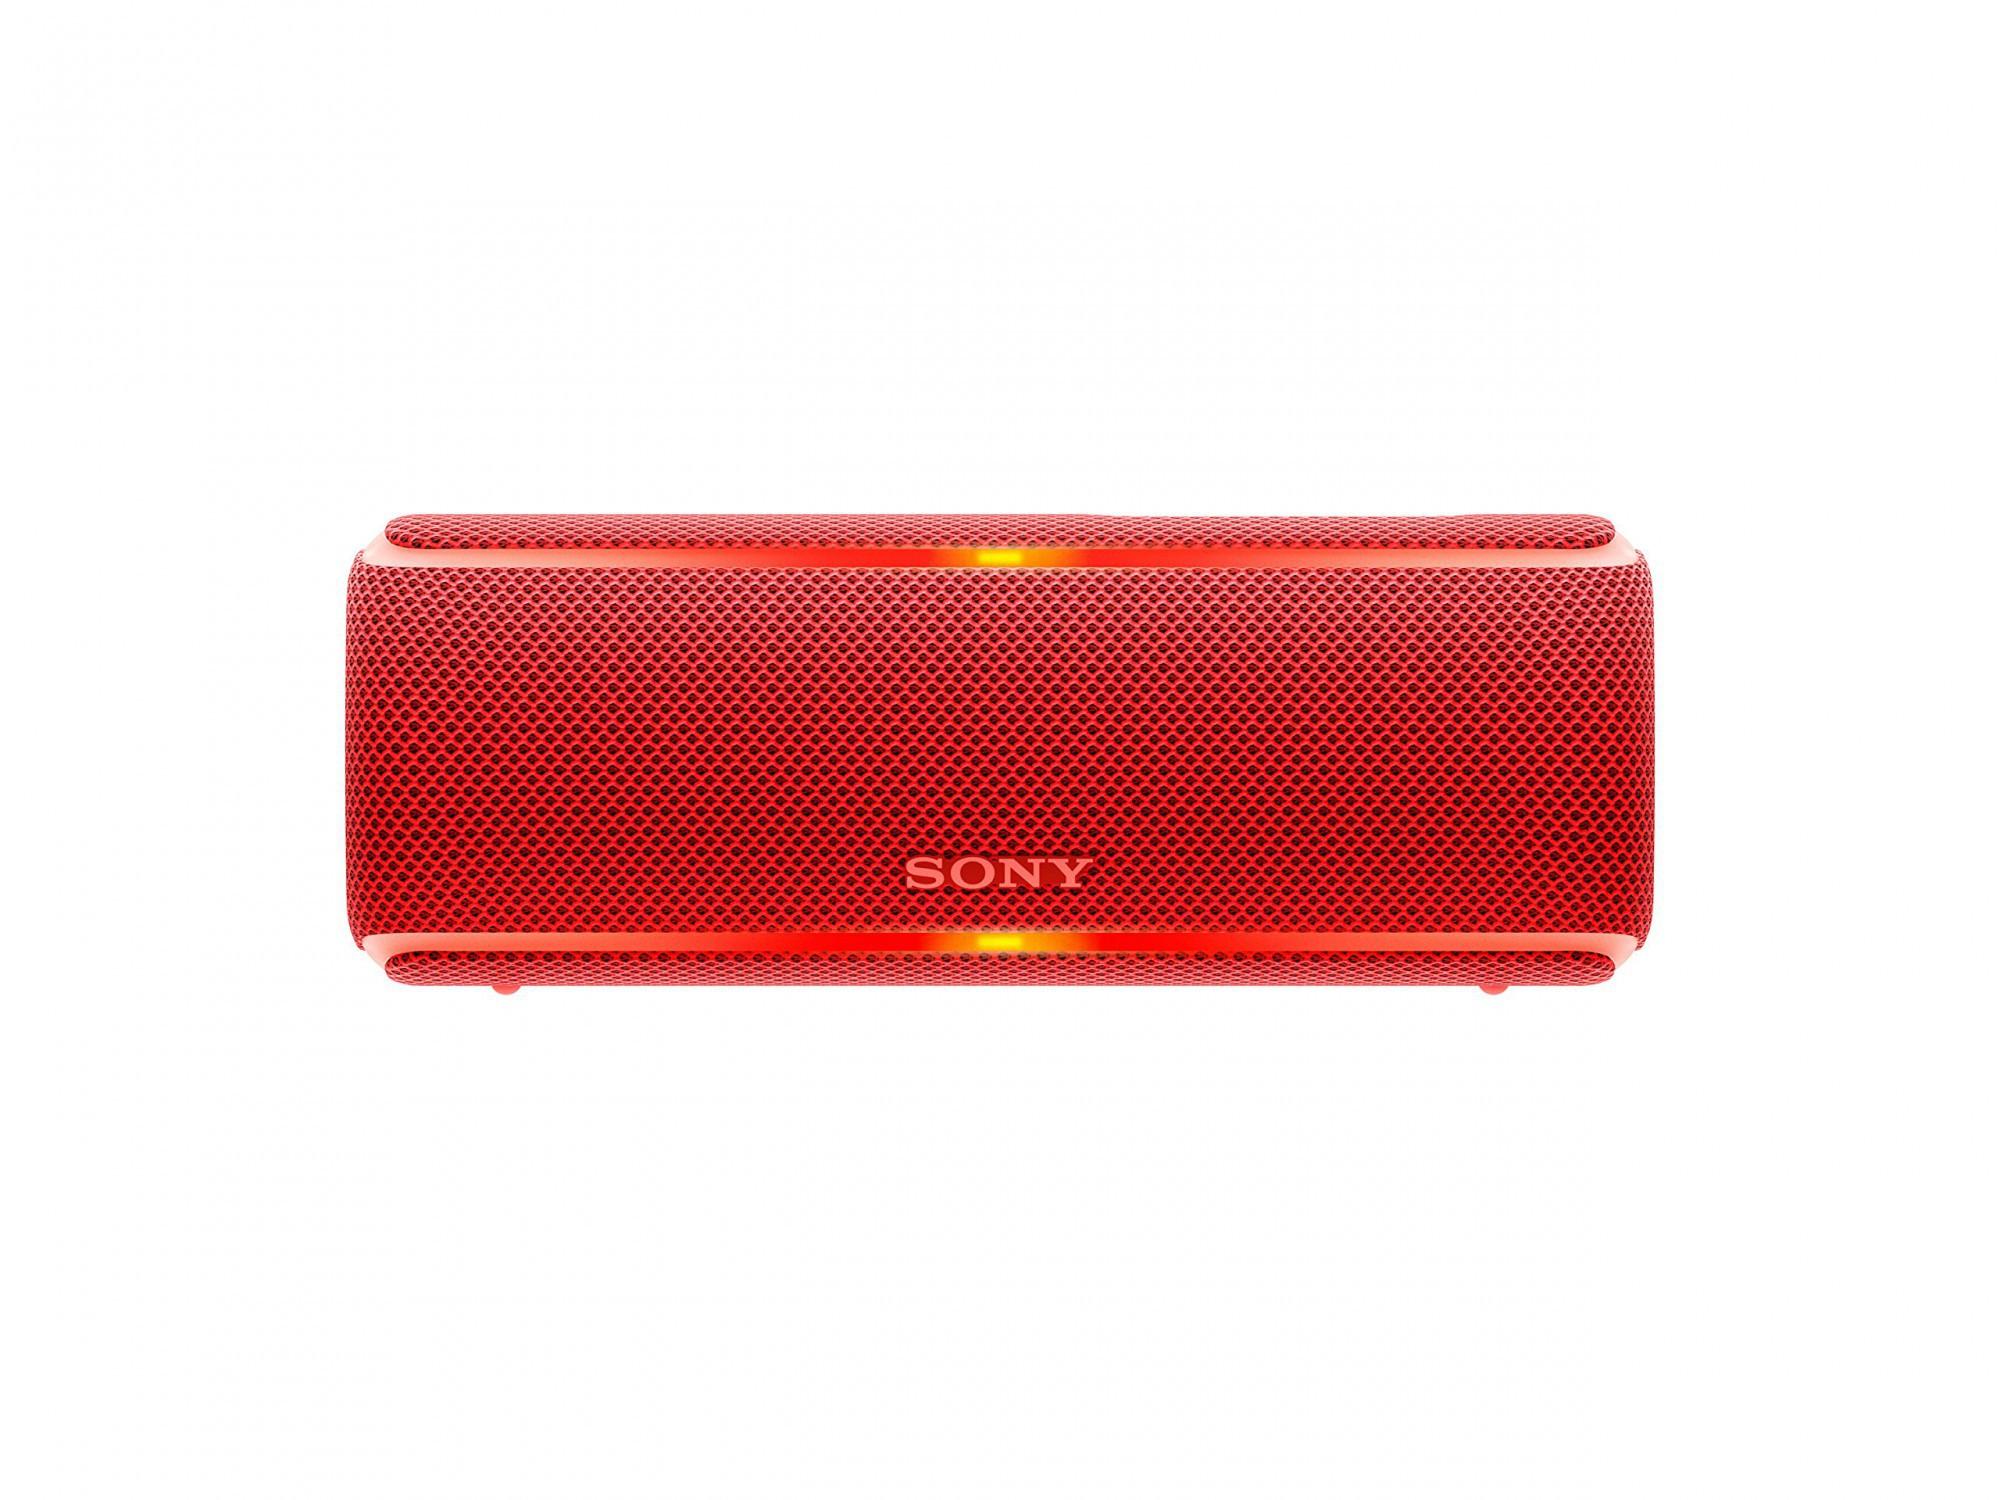 Sony SRS-XB21 kabelloser Bluetooth Lautsprecher (tragbarer, farbige Lichtleiste, Extra Bass, NFC, wasserabwe